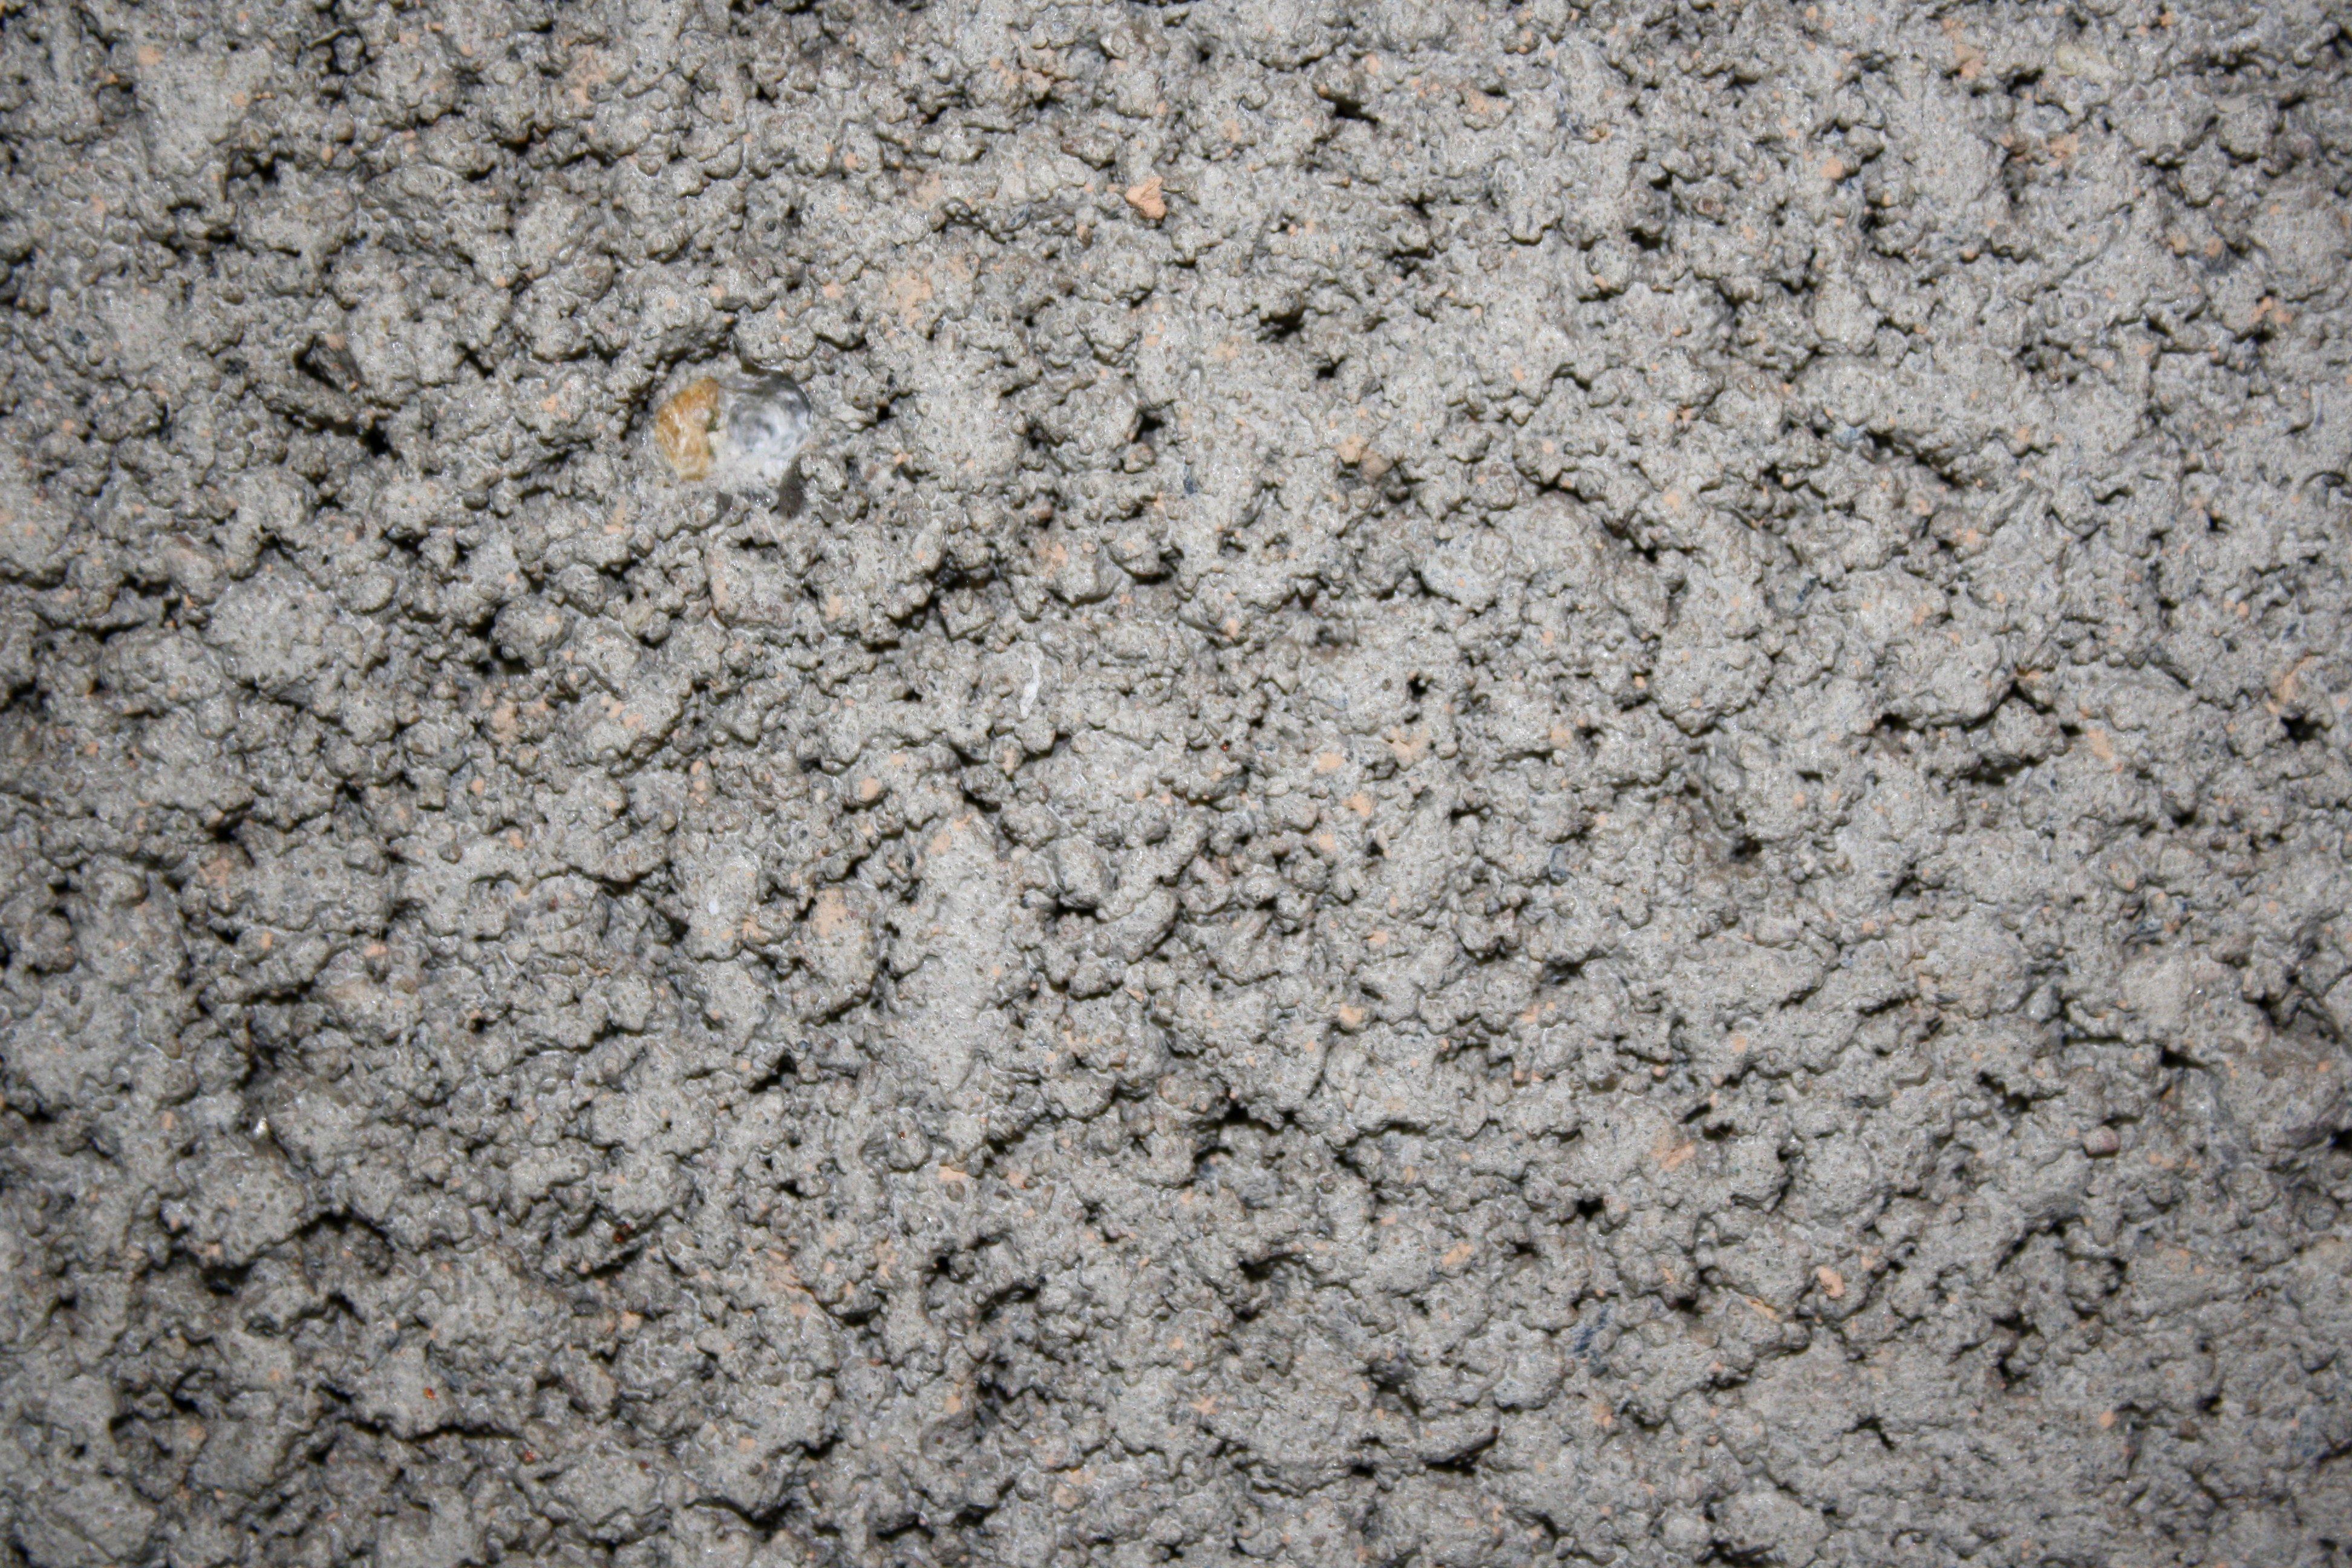 Cinder Block Close Up Texture Picture Free Photograph